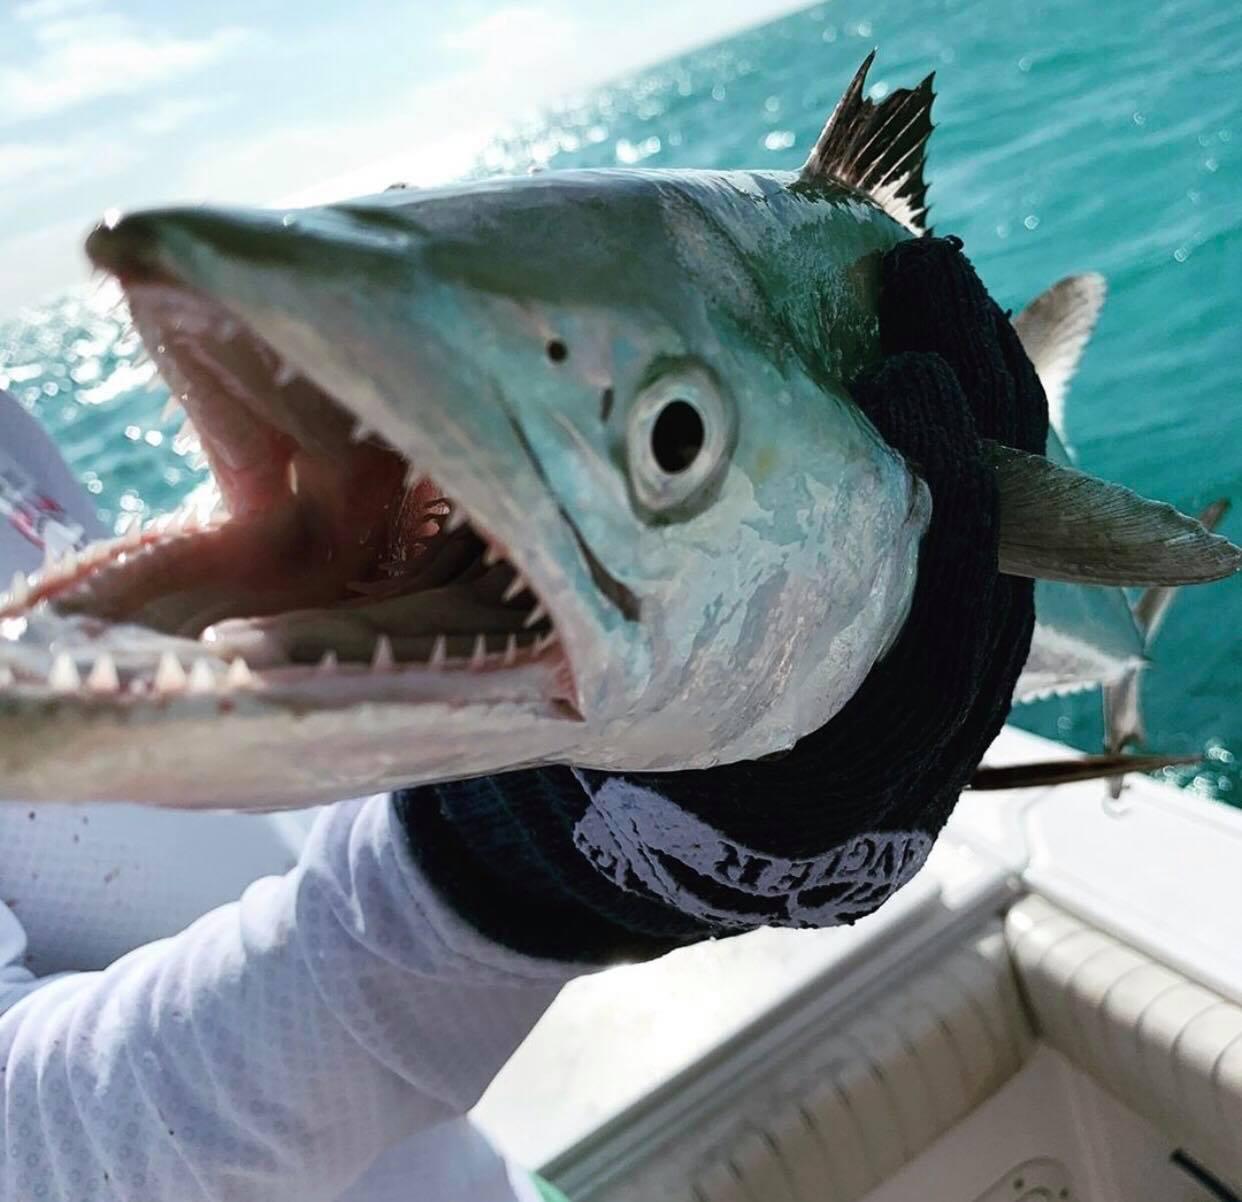 Fishing for Mackerel in the Florida Keys